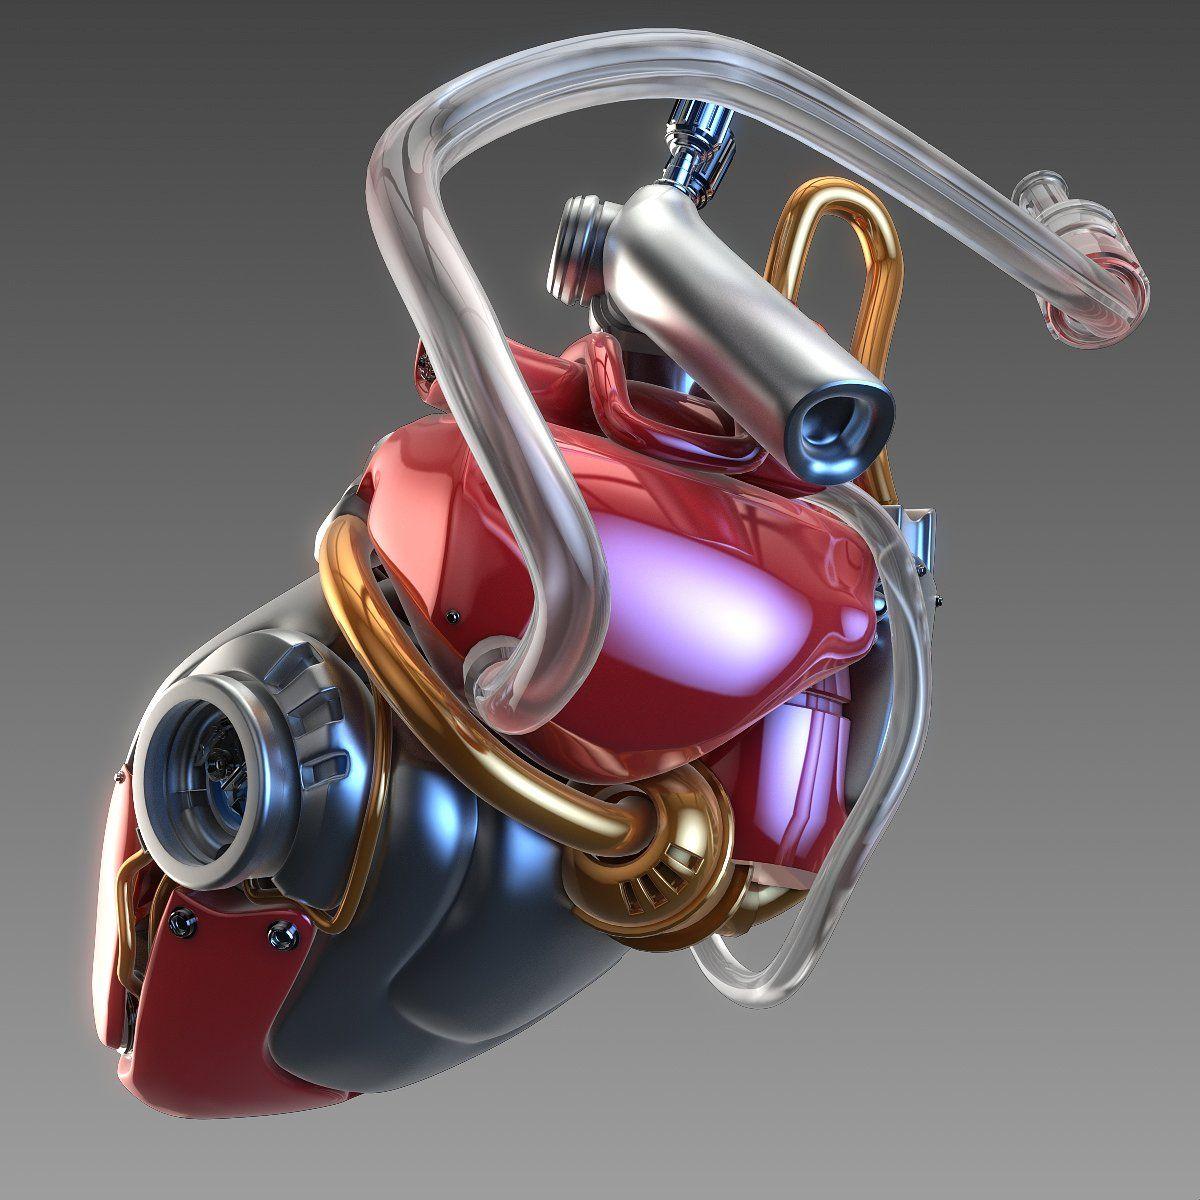 Artificial cyber heart #ds#Created#max#futuristic | 3d